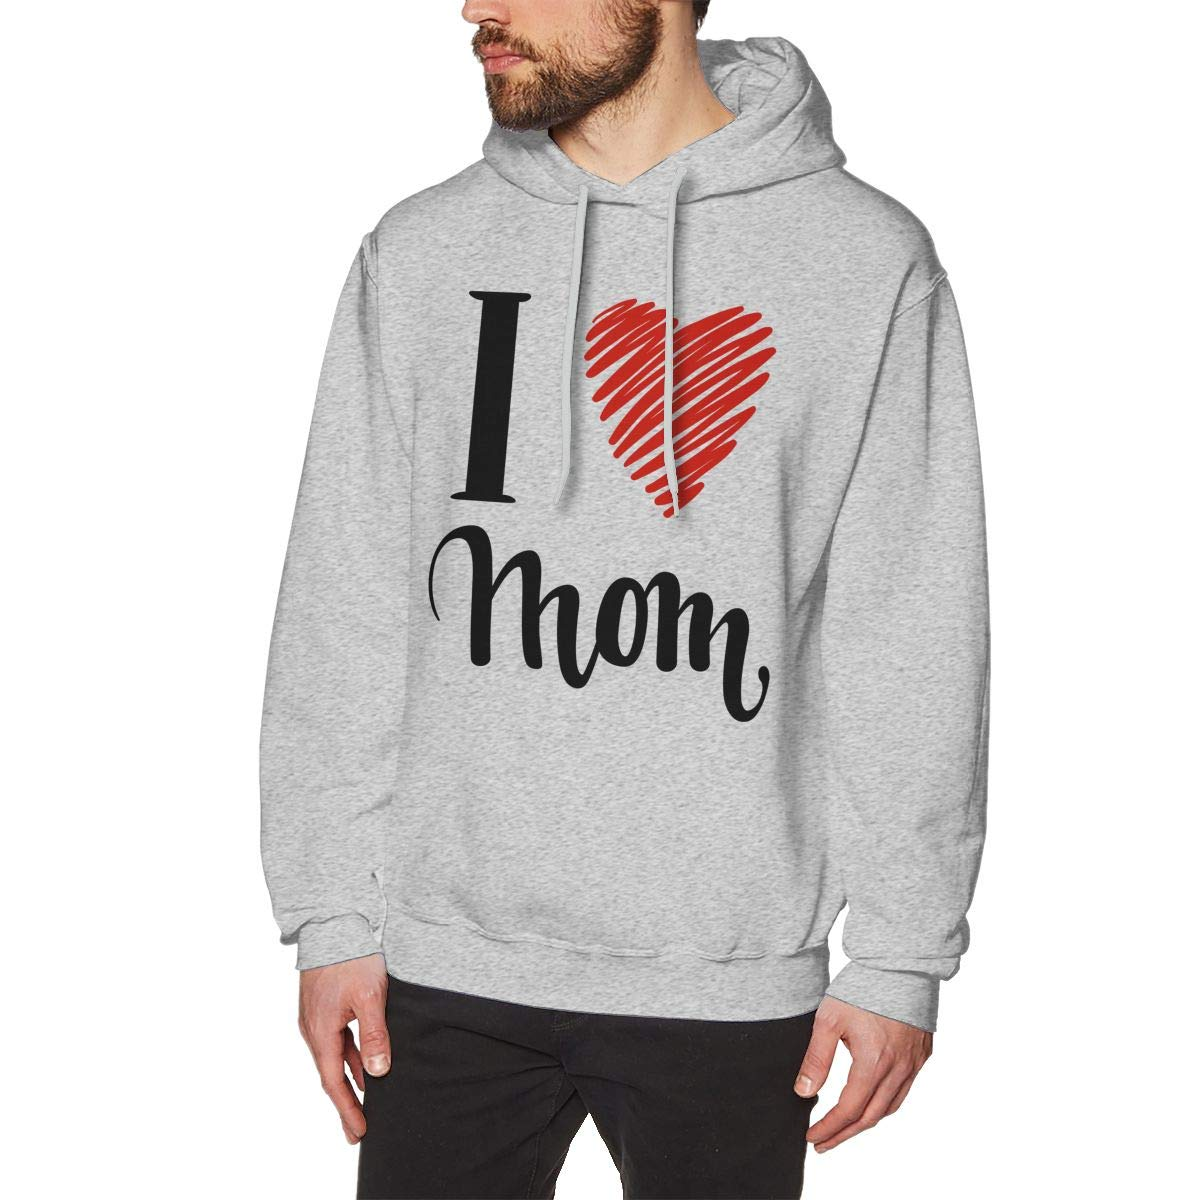 Mens Fashion Solid Color Hoodie Long Sleeve Drawstring I Love You Mom Hooded Sweatshirt